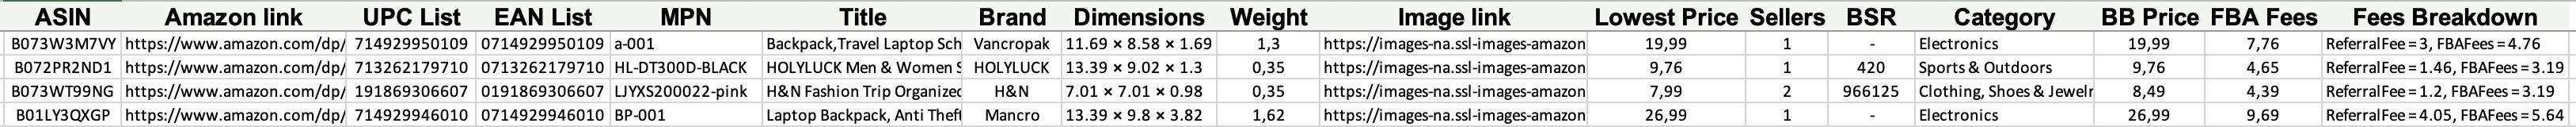 Bulk conversion result file example